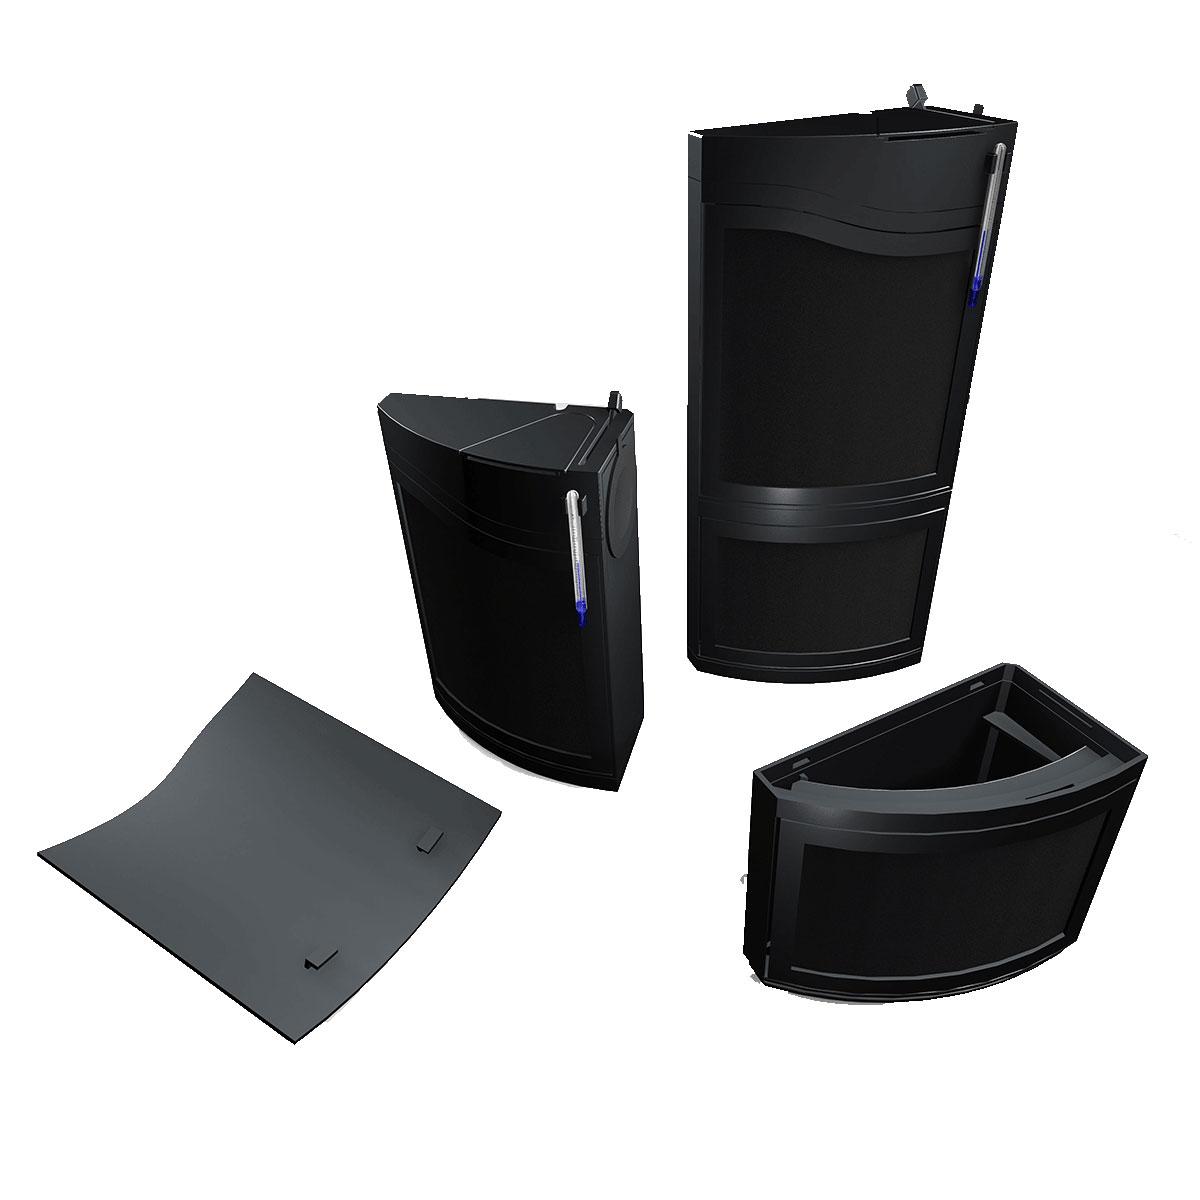 jbl innenfilter cristalprofi m greenline kaufen bei zooroyal. Black Bedroom Furniture Sets. Home Design Ideas